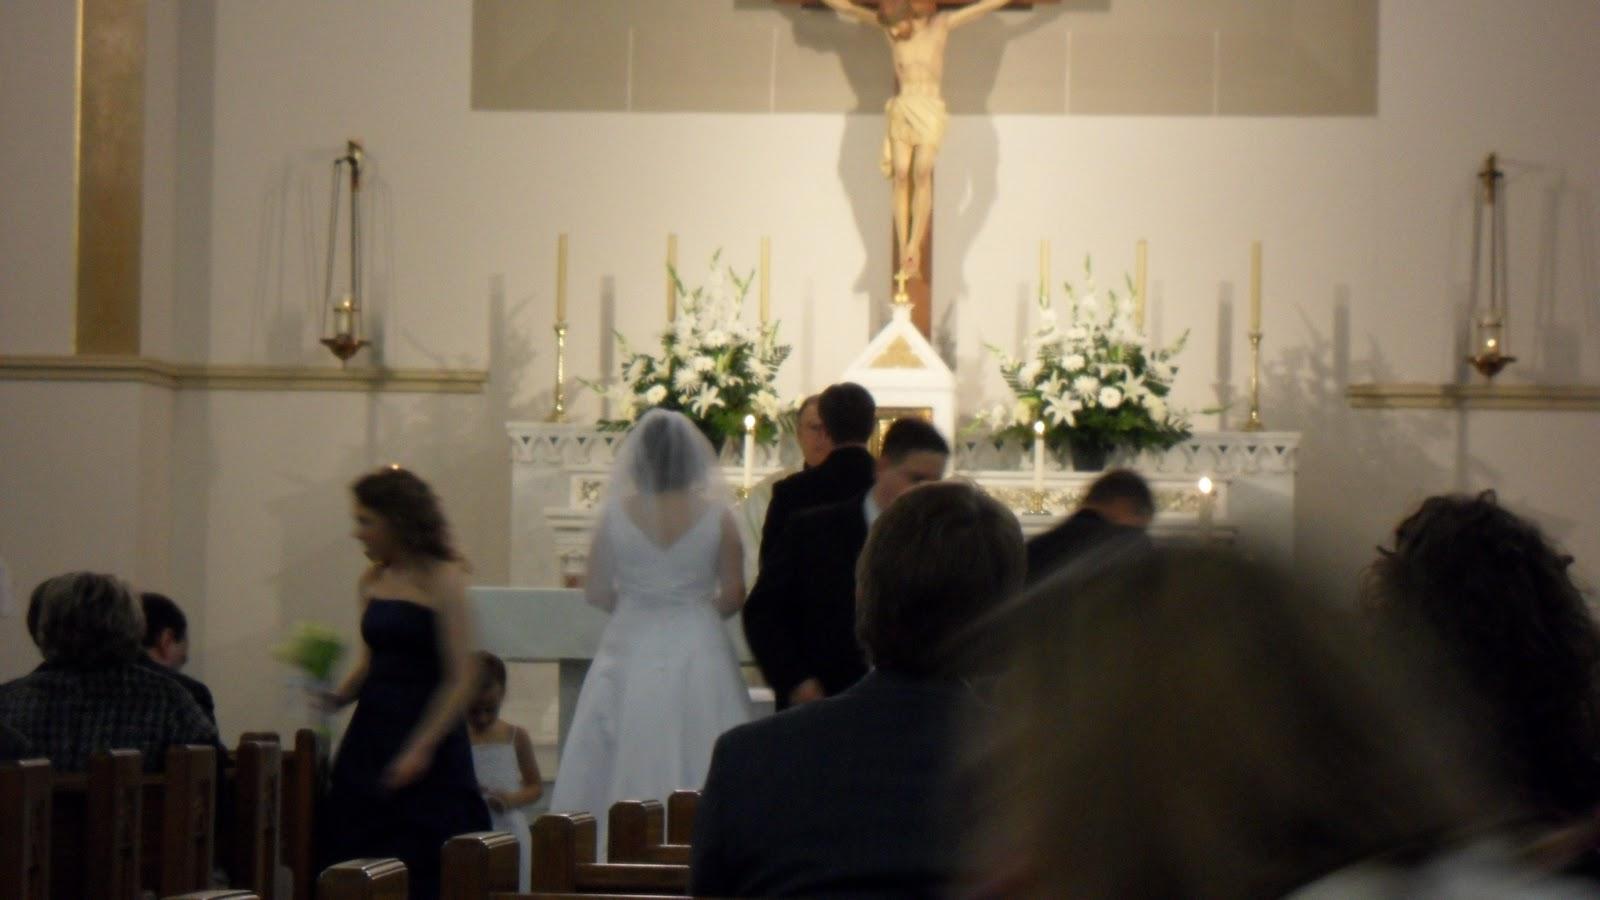 Our Wedding, photos by Rachel Perez - SAM_0114.JPG